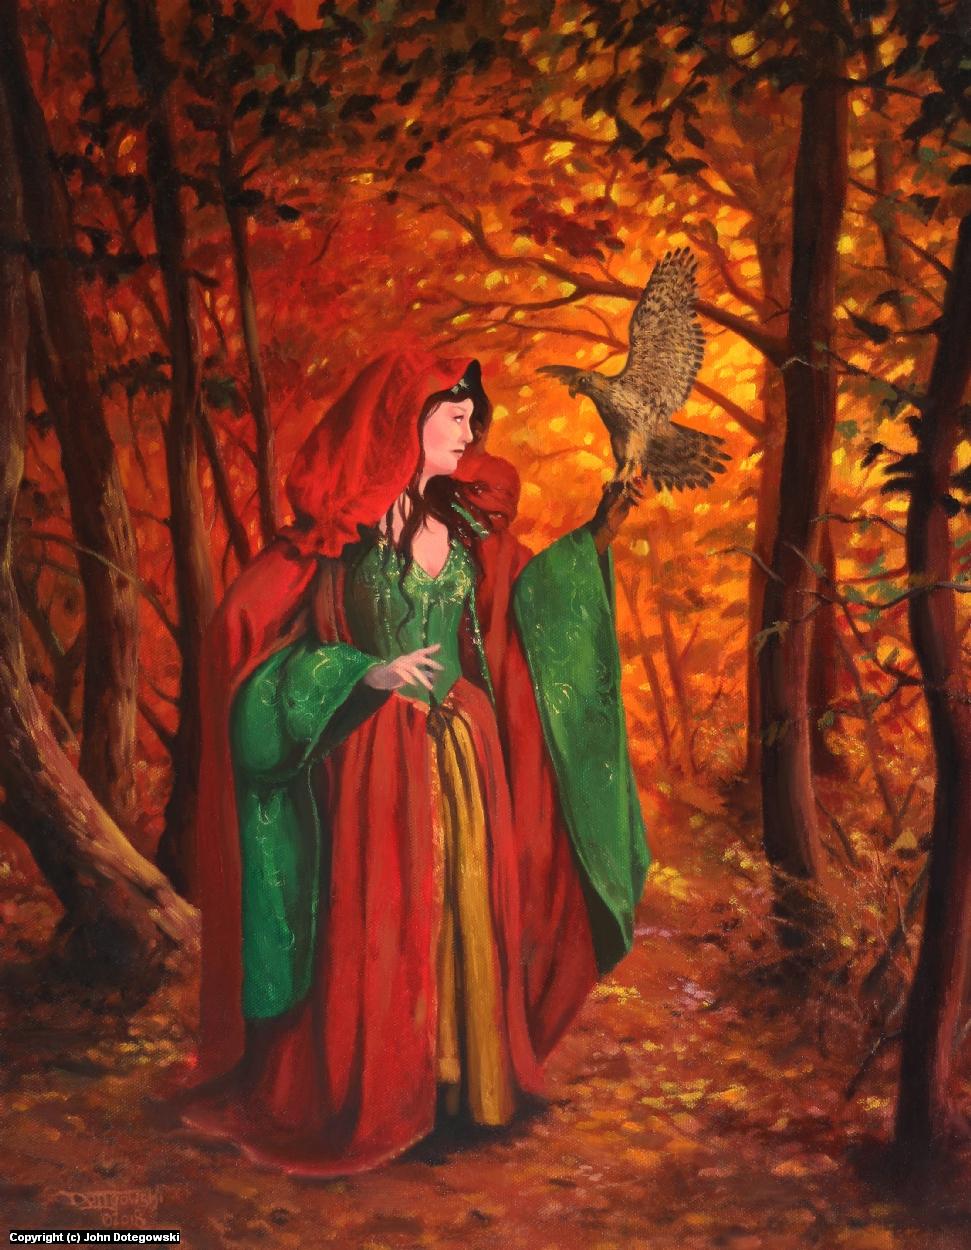 Autumn Sentinel Artwork by John Dotegowski